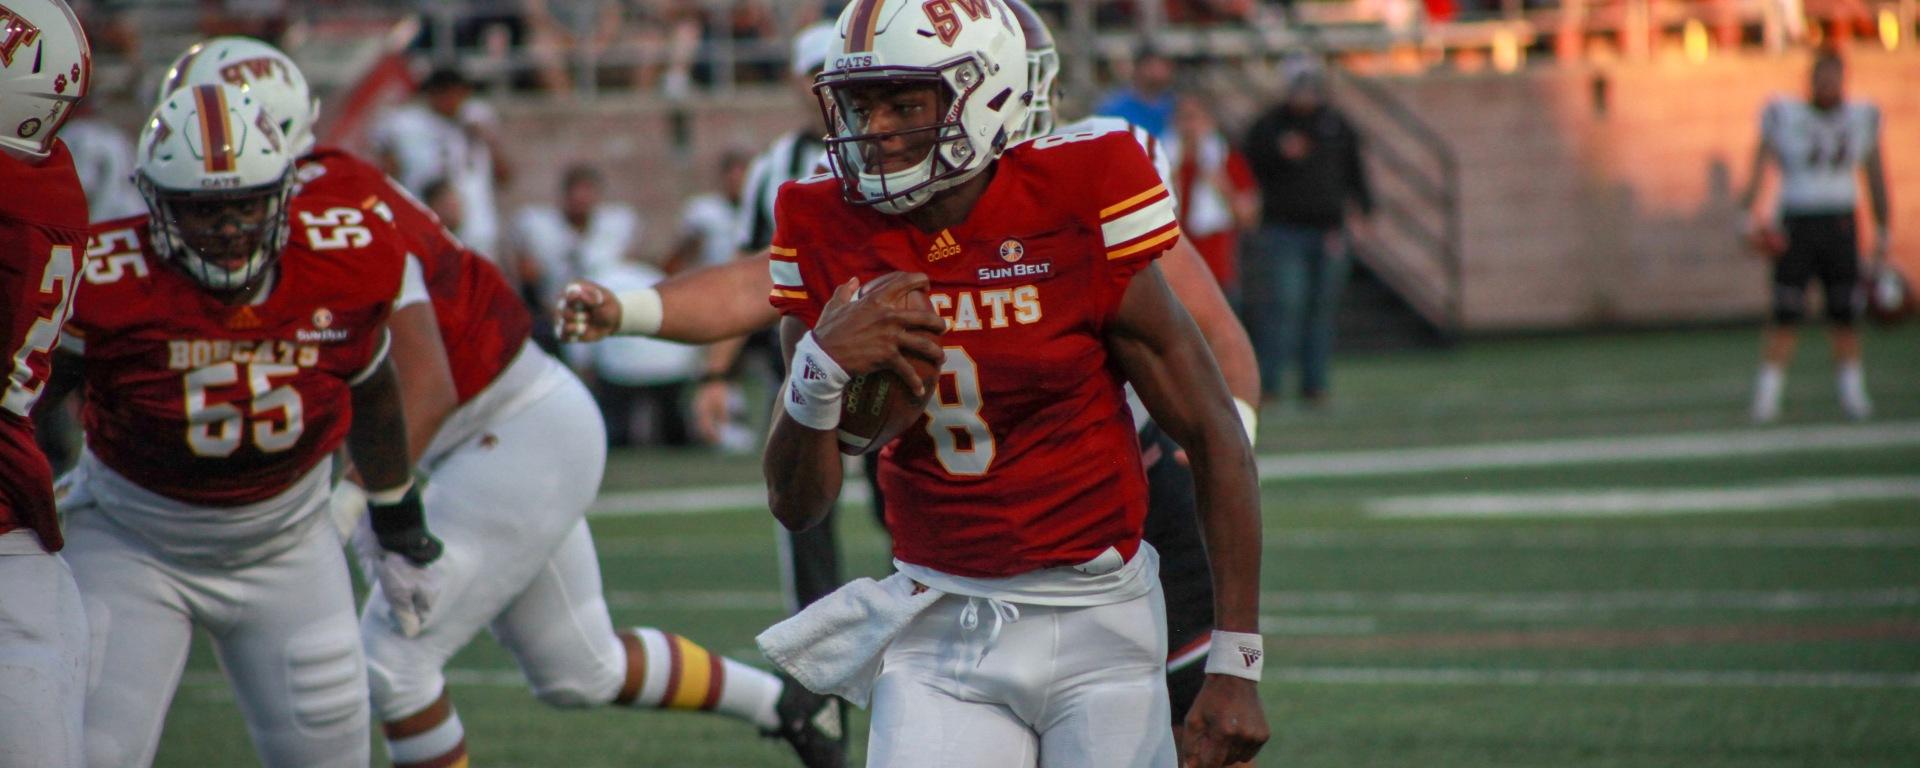 Willie Jones III breaks away from the New Mexico defense.